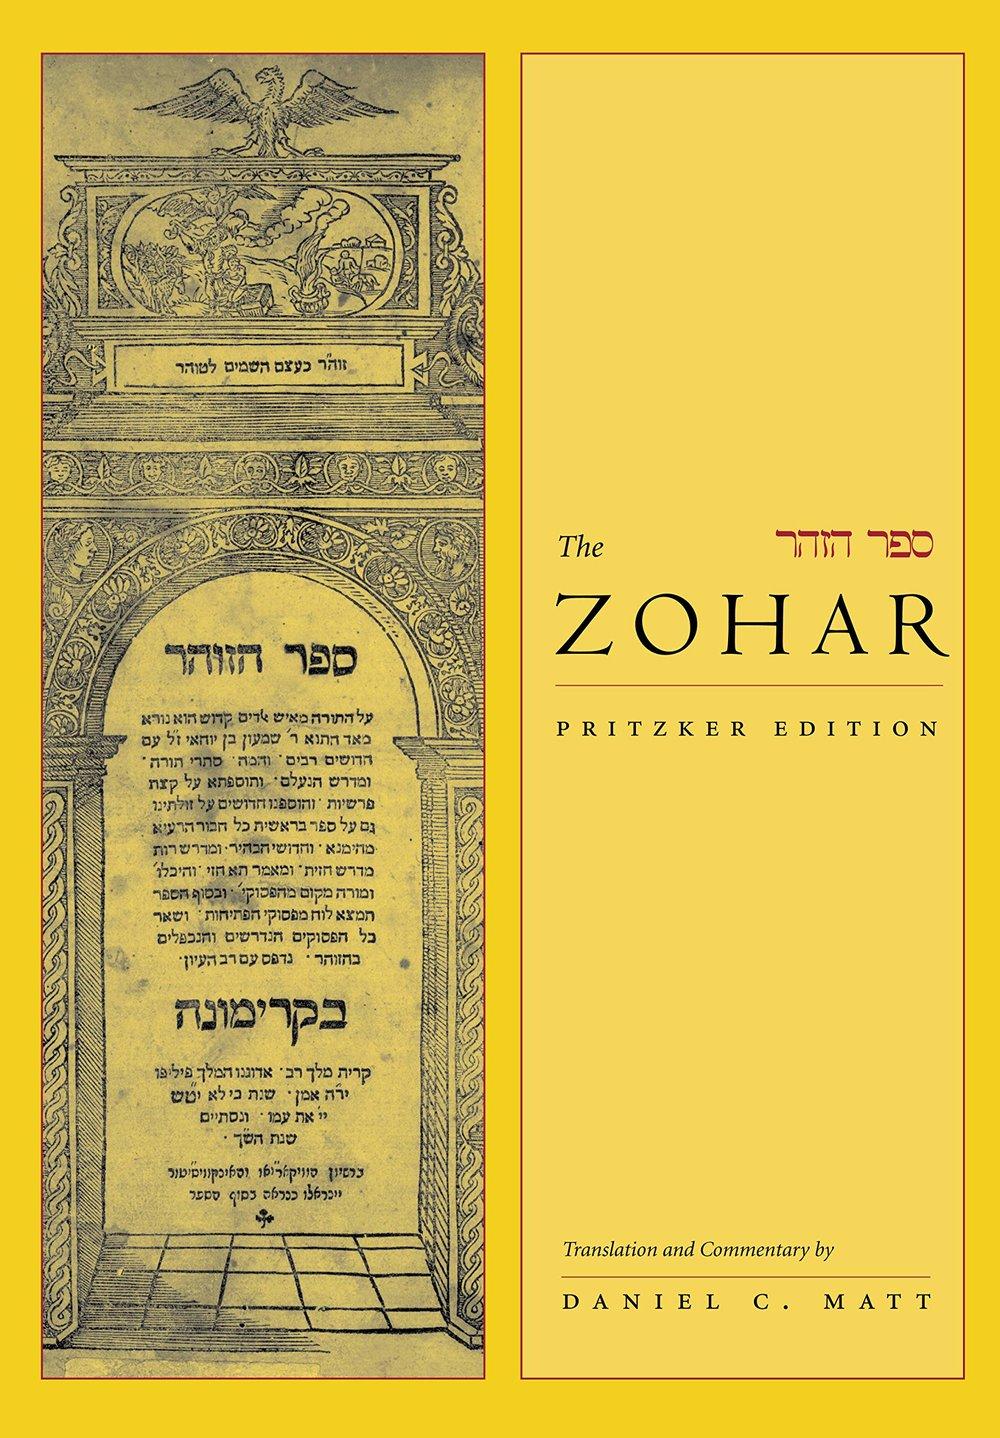 Zohar Pritzker Edition.jpg